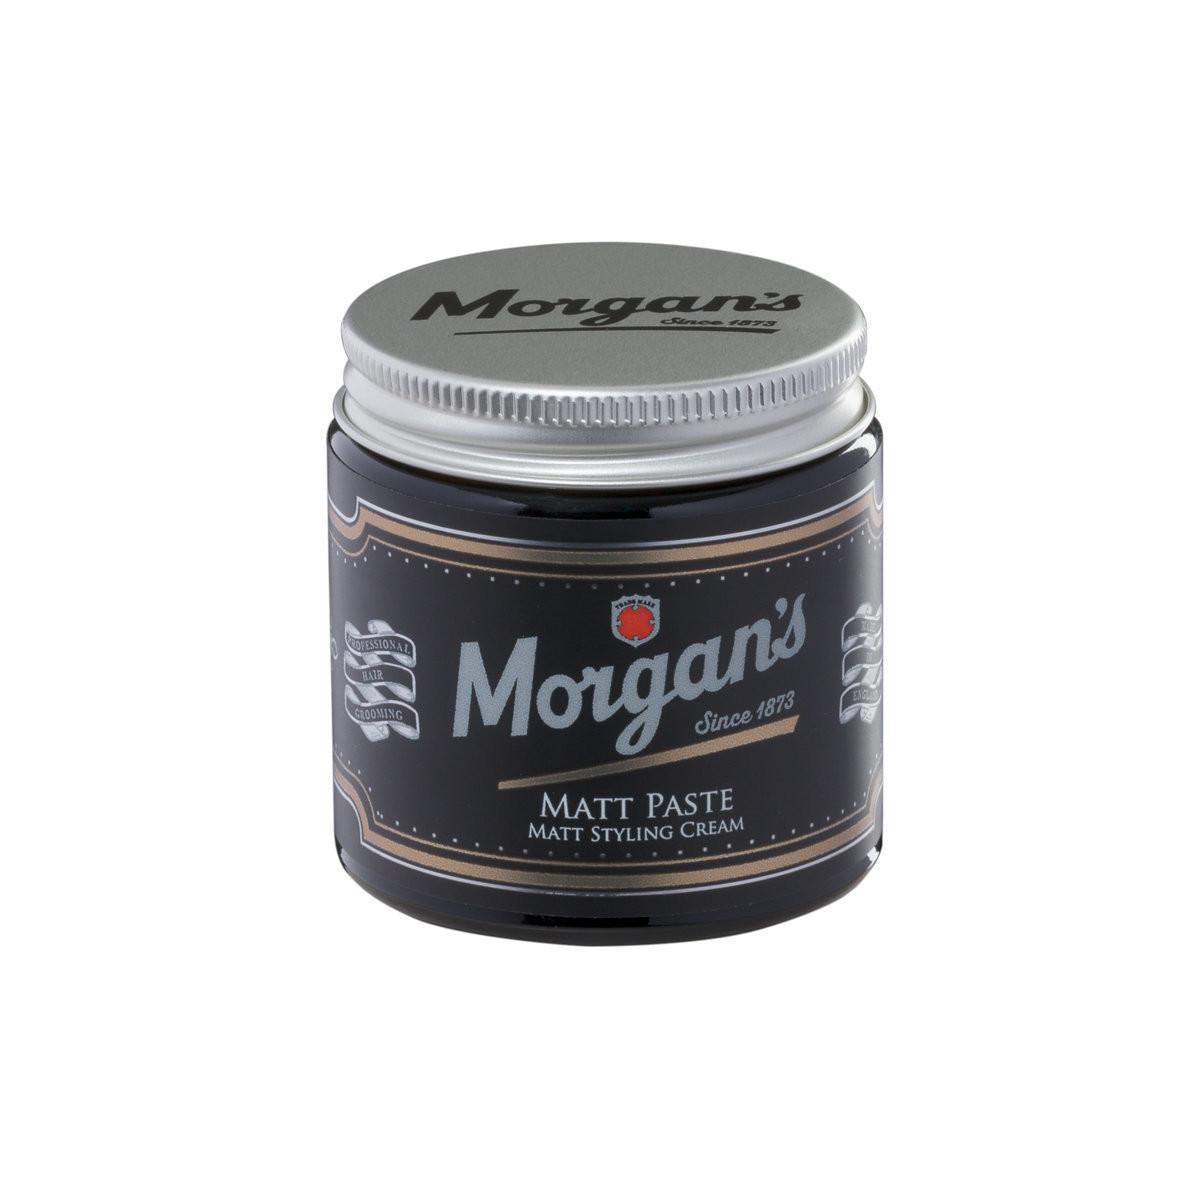 MORGAN'S Matt Paste / Матовая паста 120 мл